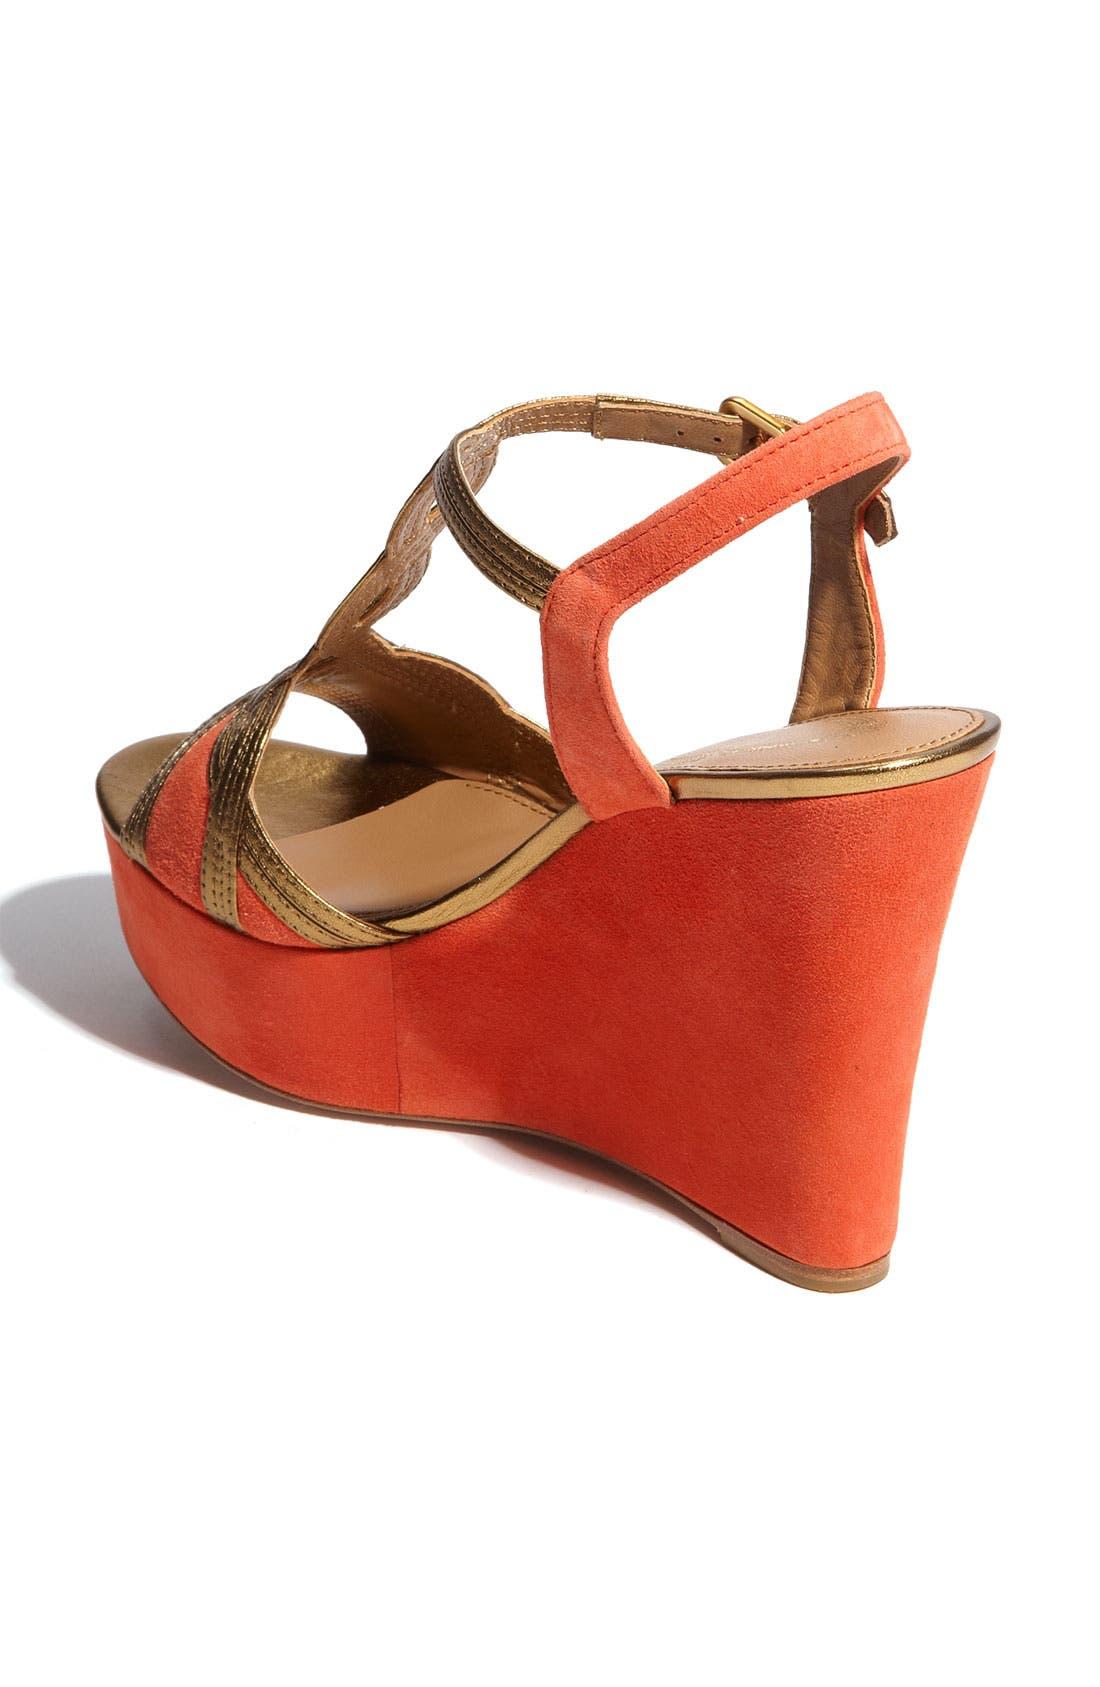 Alternate Image 2  - Elie Tahari 'Lynette' Wedge Sandal